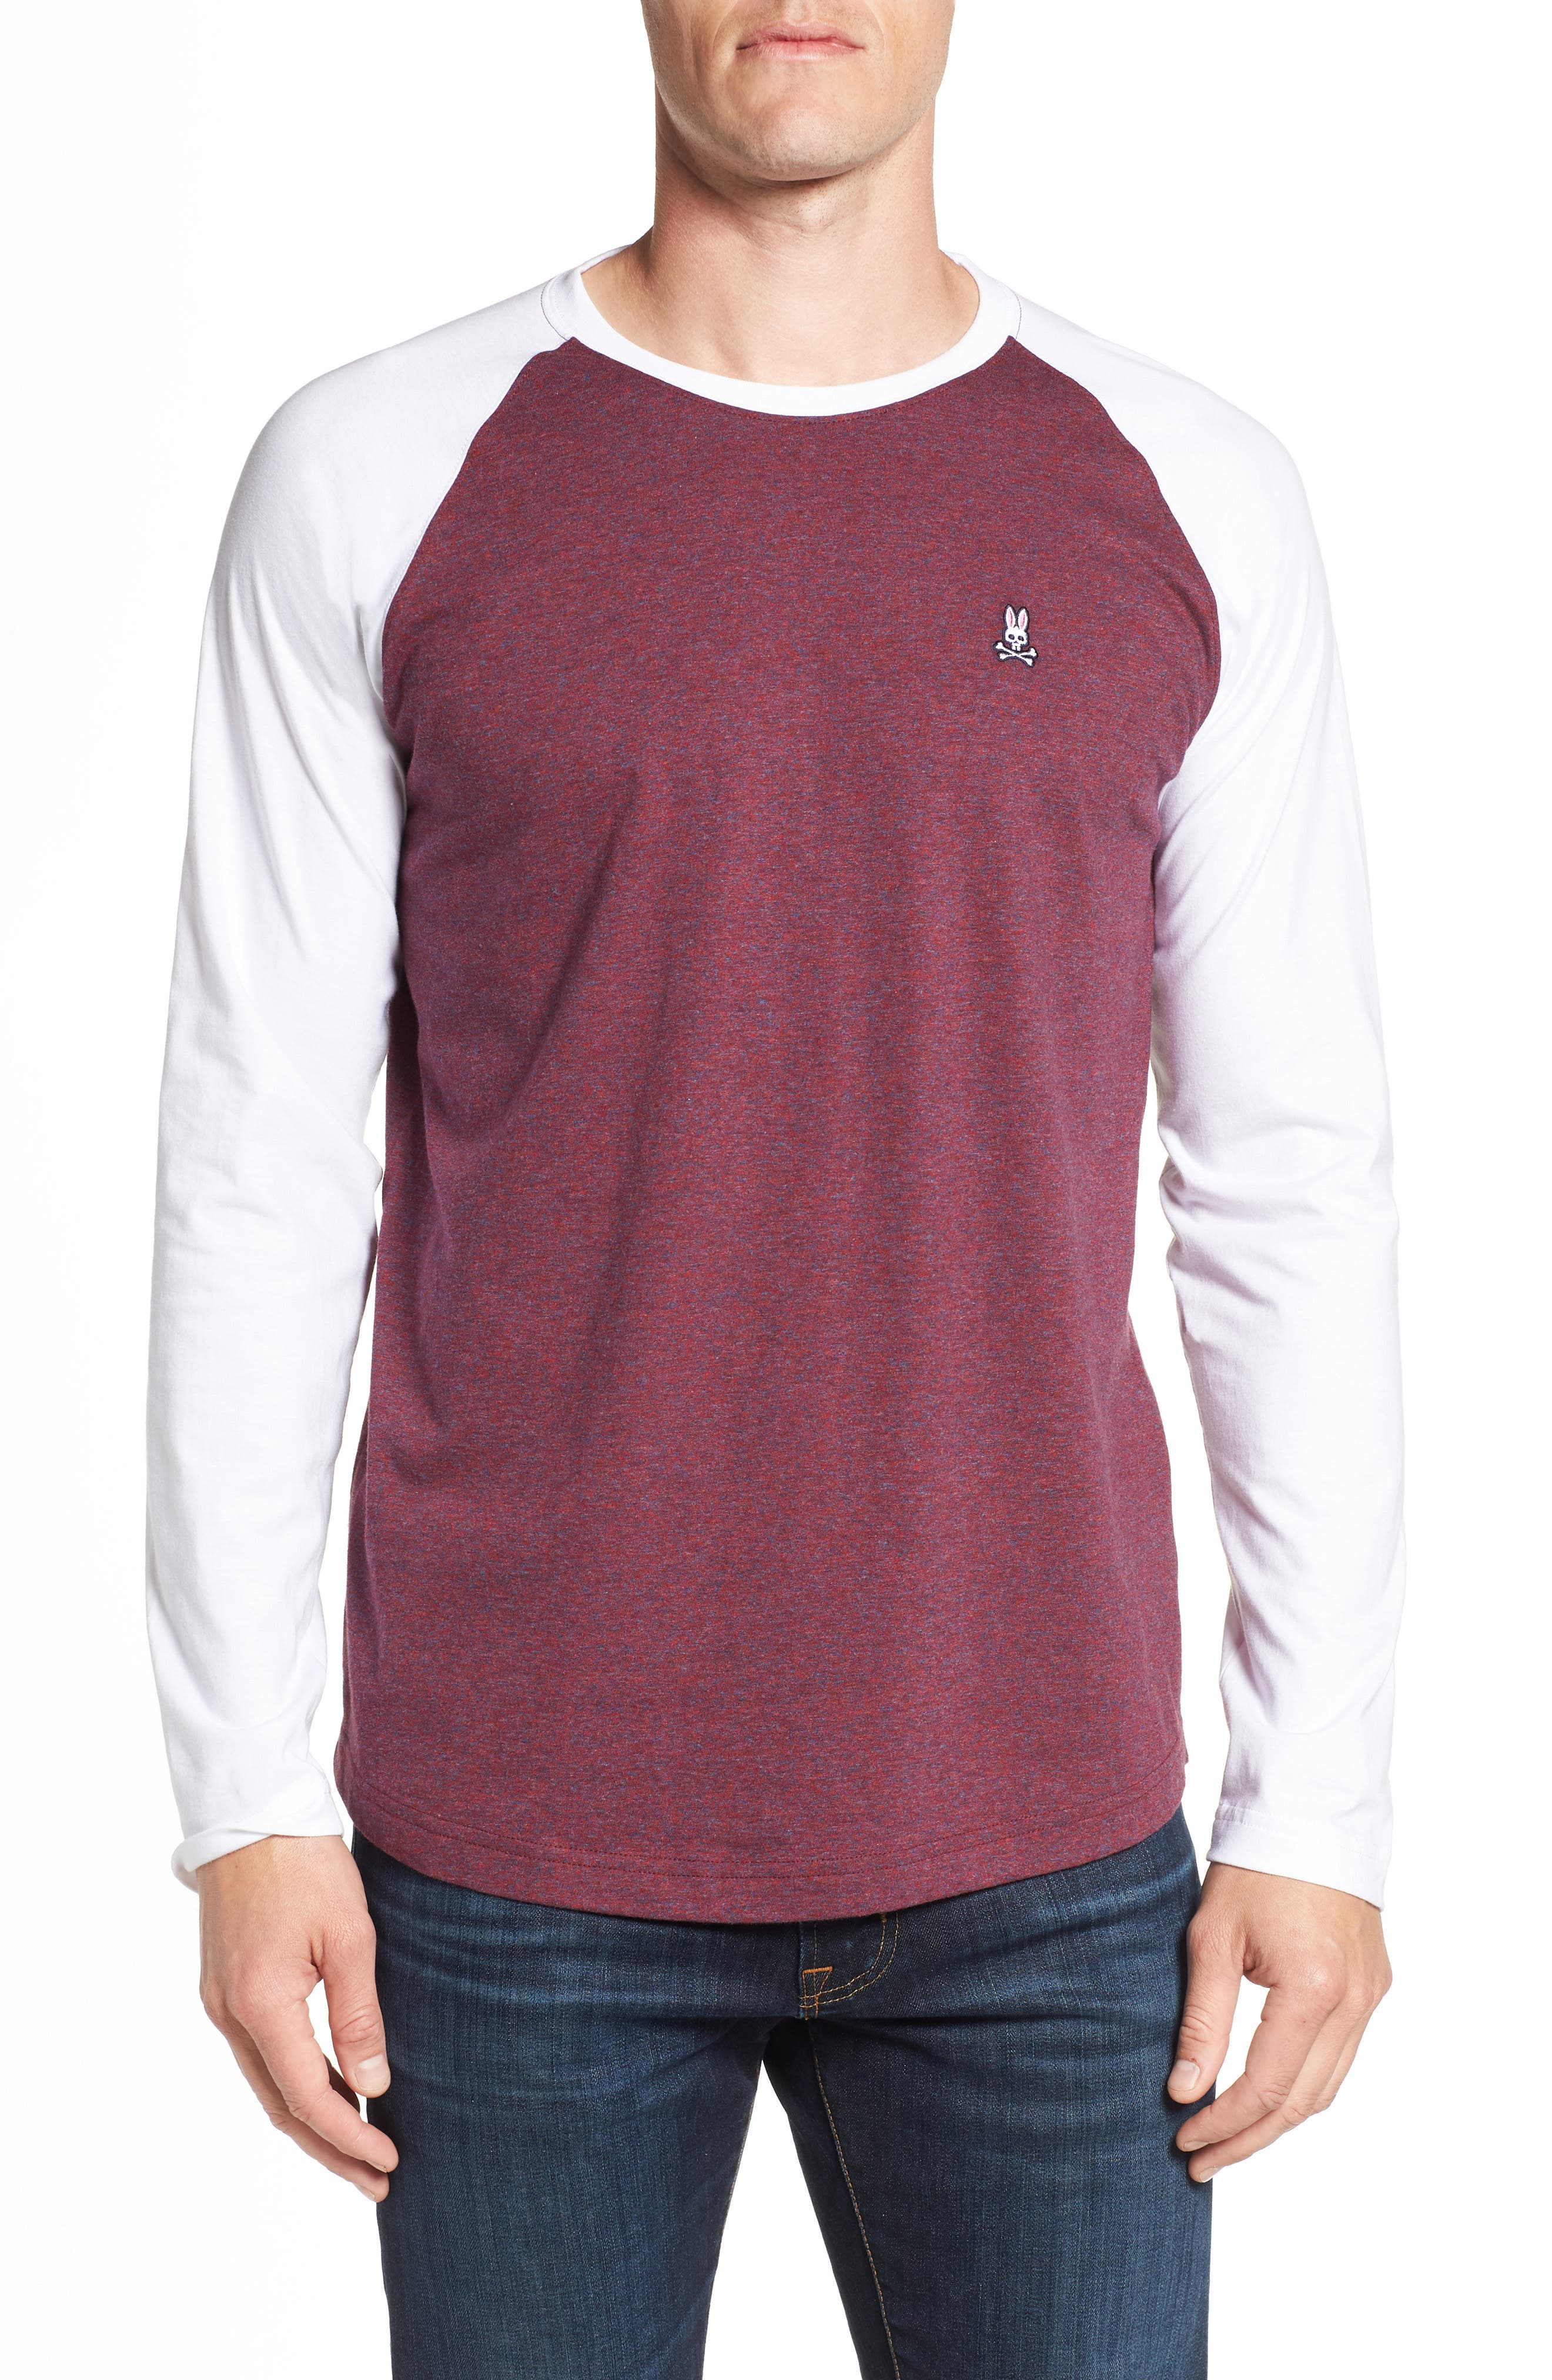 Cobb Raglan T-Shirt,                         Main,                         color, BURGUNDY SALT PEPPER